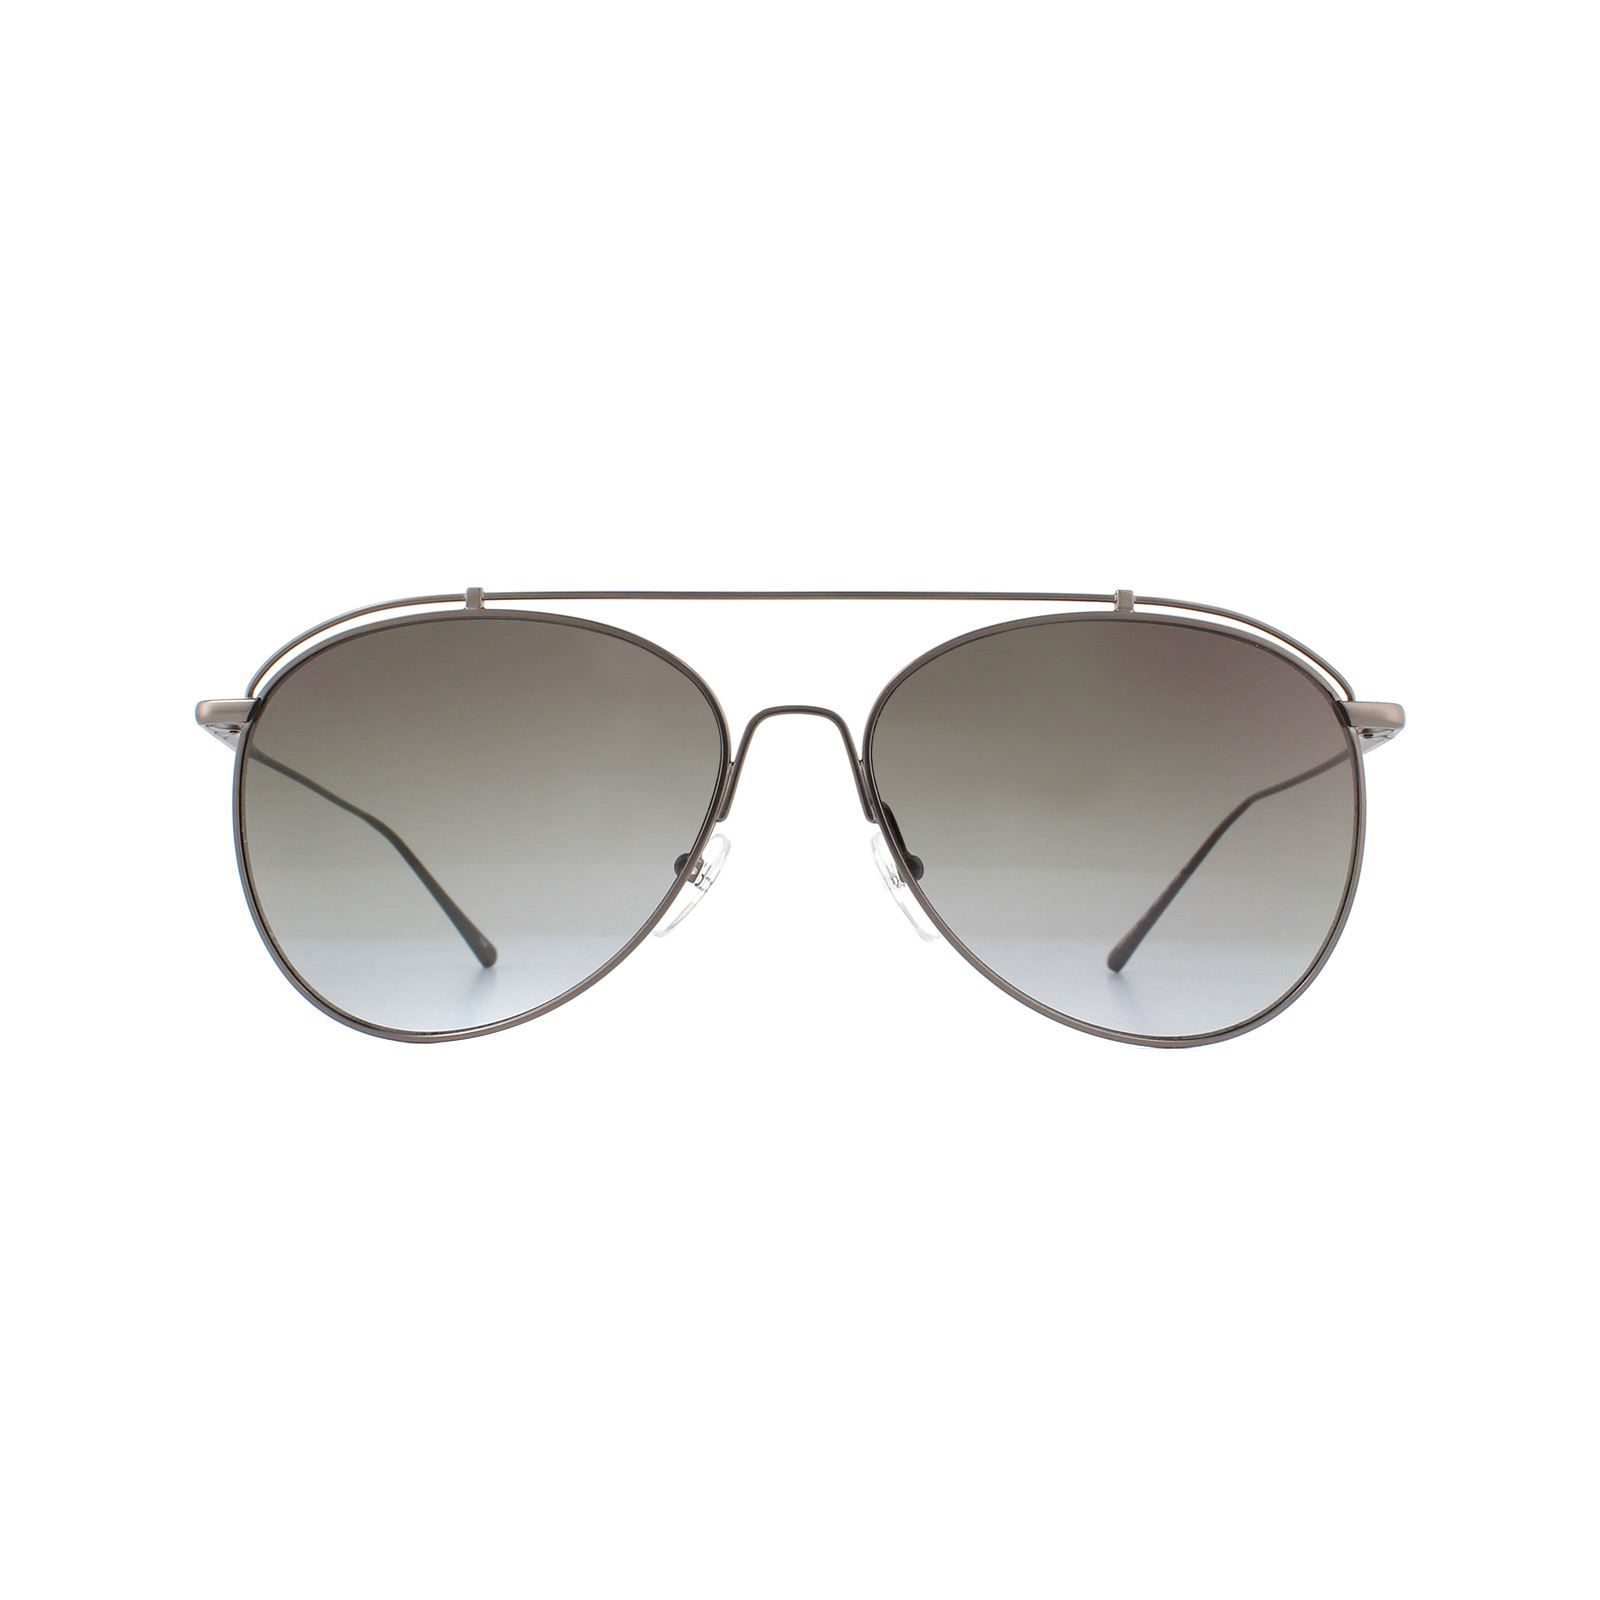 Calvin Klein Sunglasses CK2163S 061 Matte Gunmetal Grey